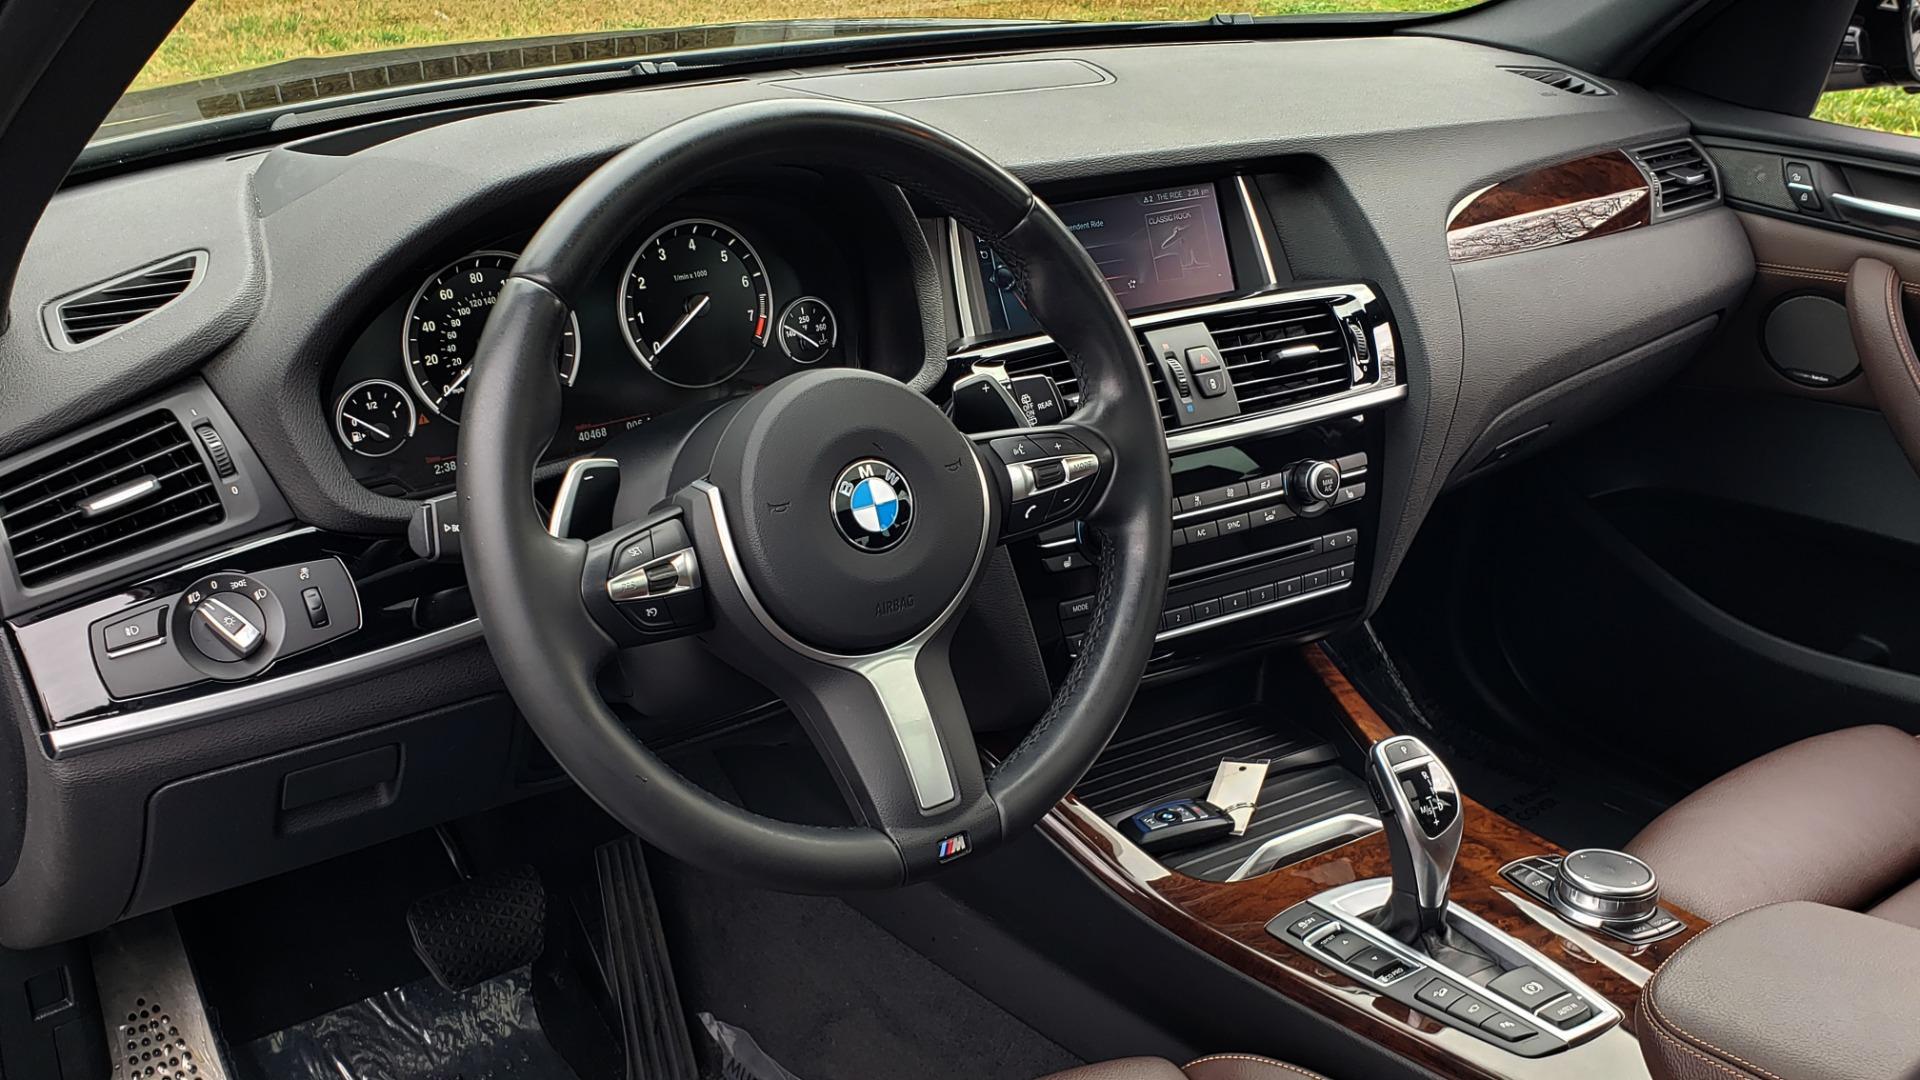 Used 2017 BMW X3 XDRIVE35I M-SPORT / DRVR ASST PLUS / TECHNOLOGY / HUD / BLIND SPOT for sale Sold at Formula Imports in Charlotte NC 28227 36